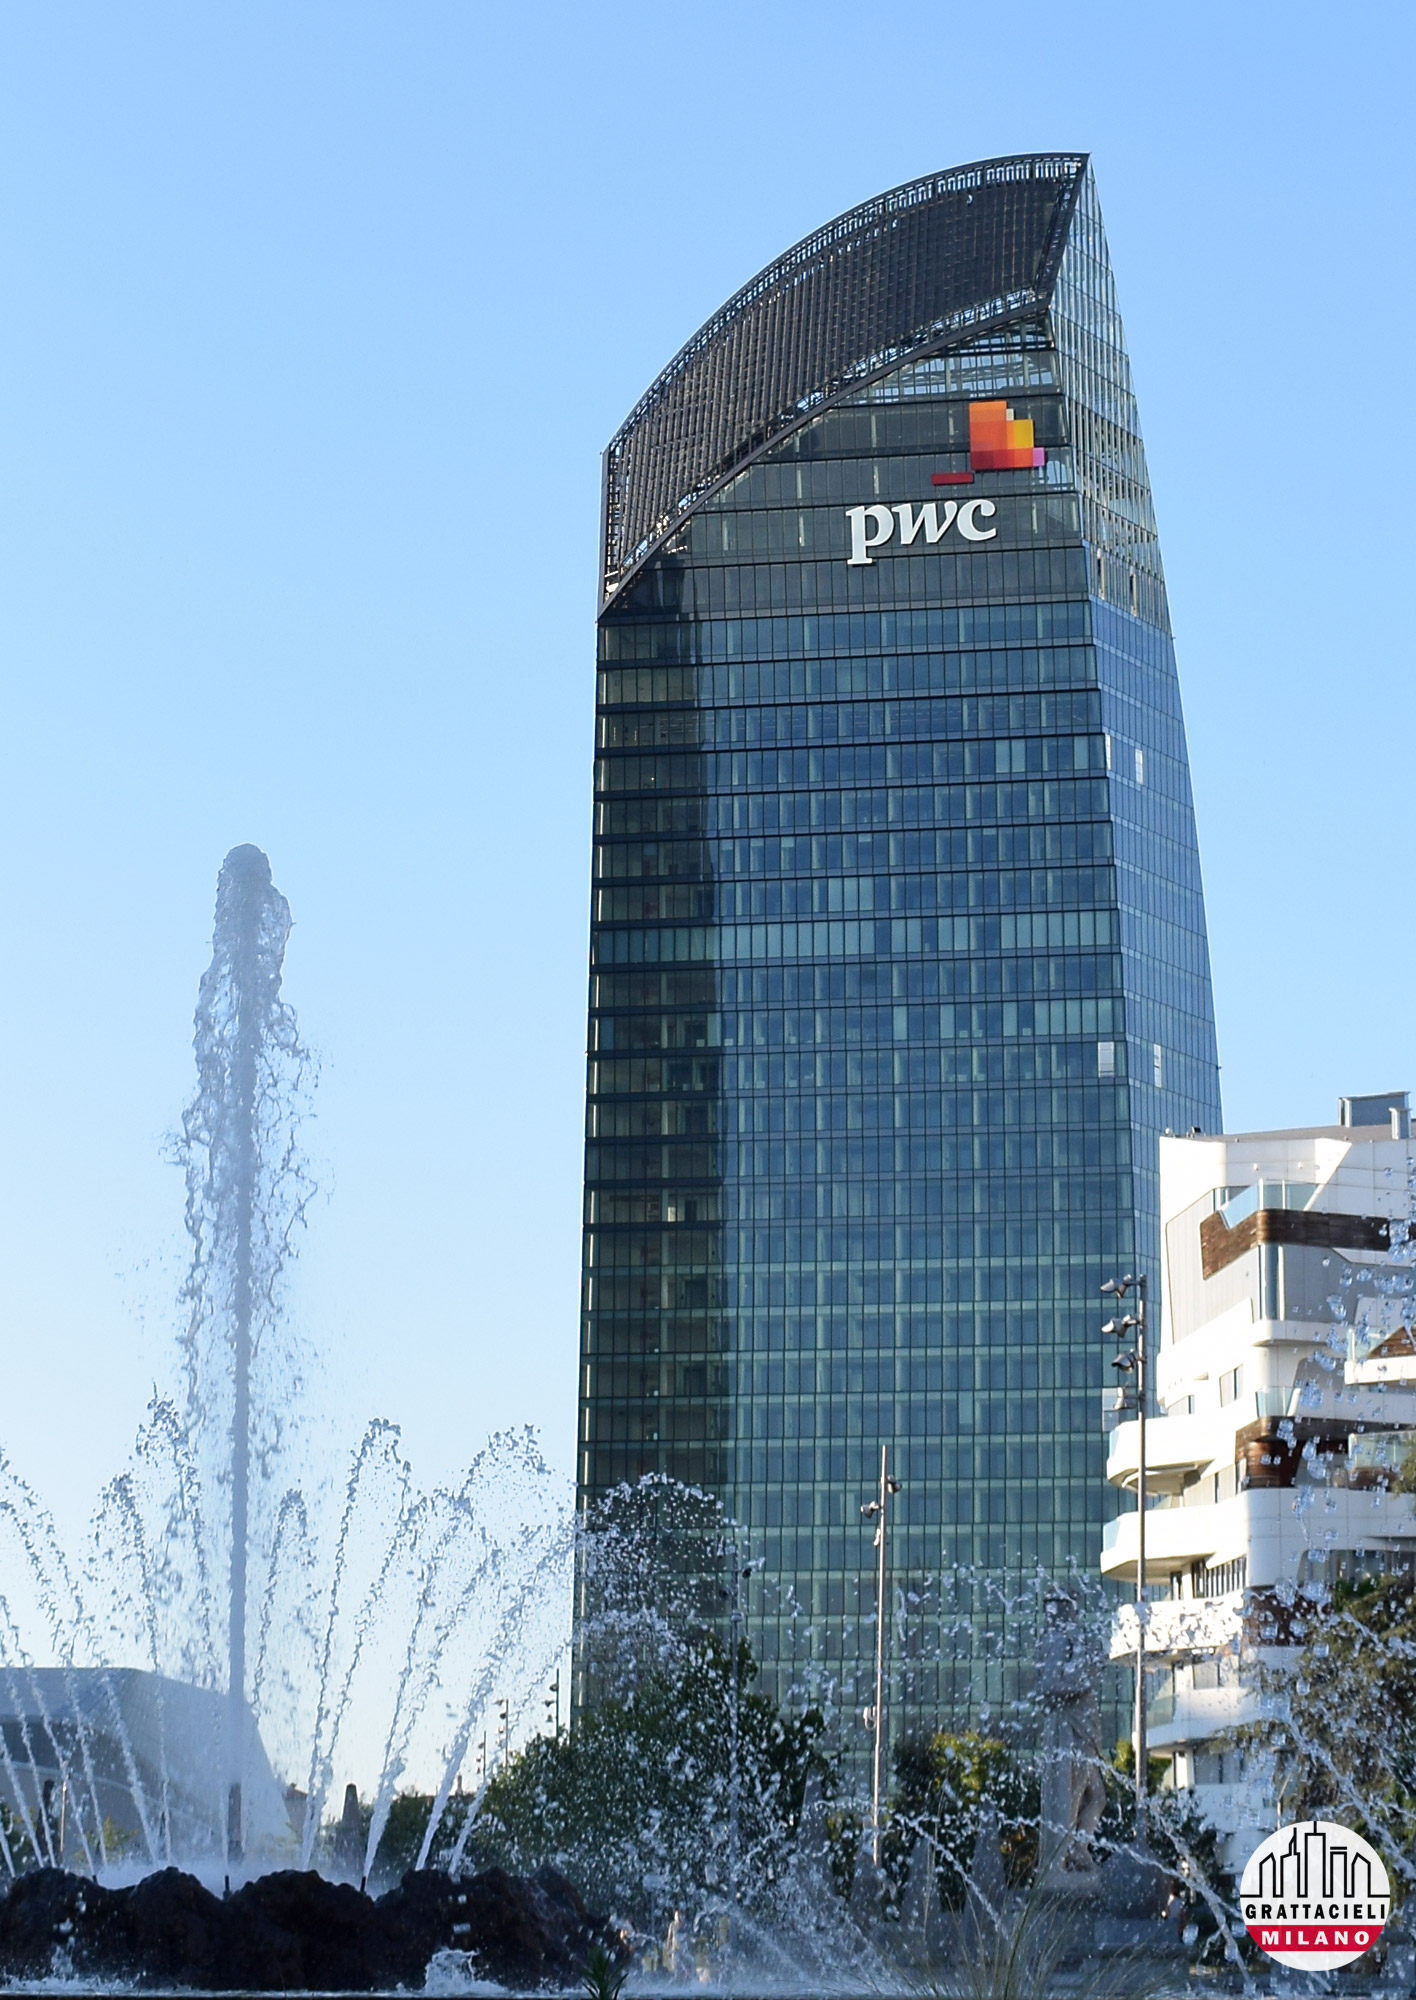 PwC Tower (Libeskind) - Photo by Demetrio Rizzo